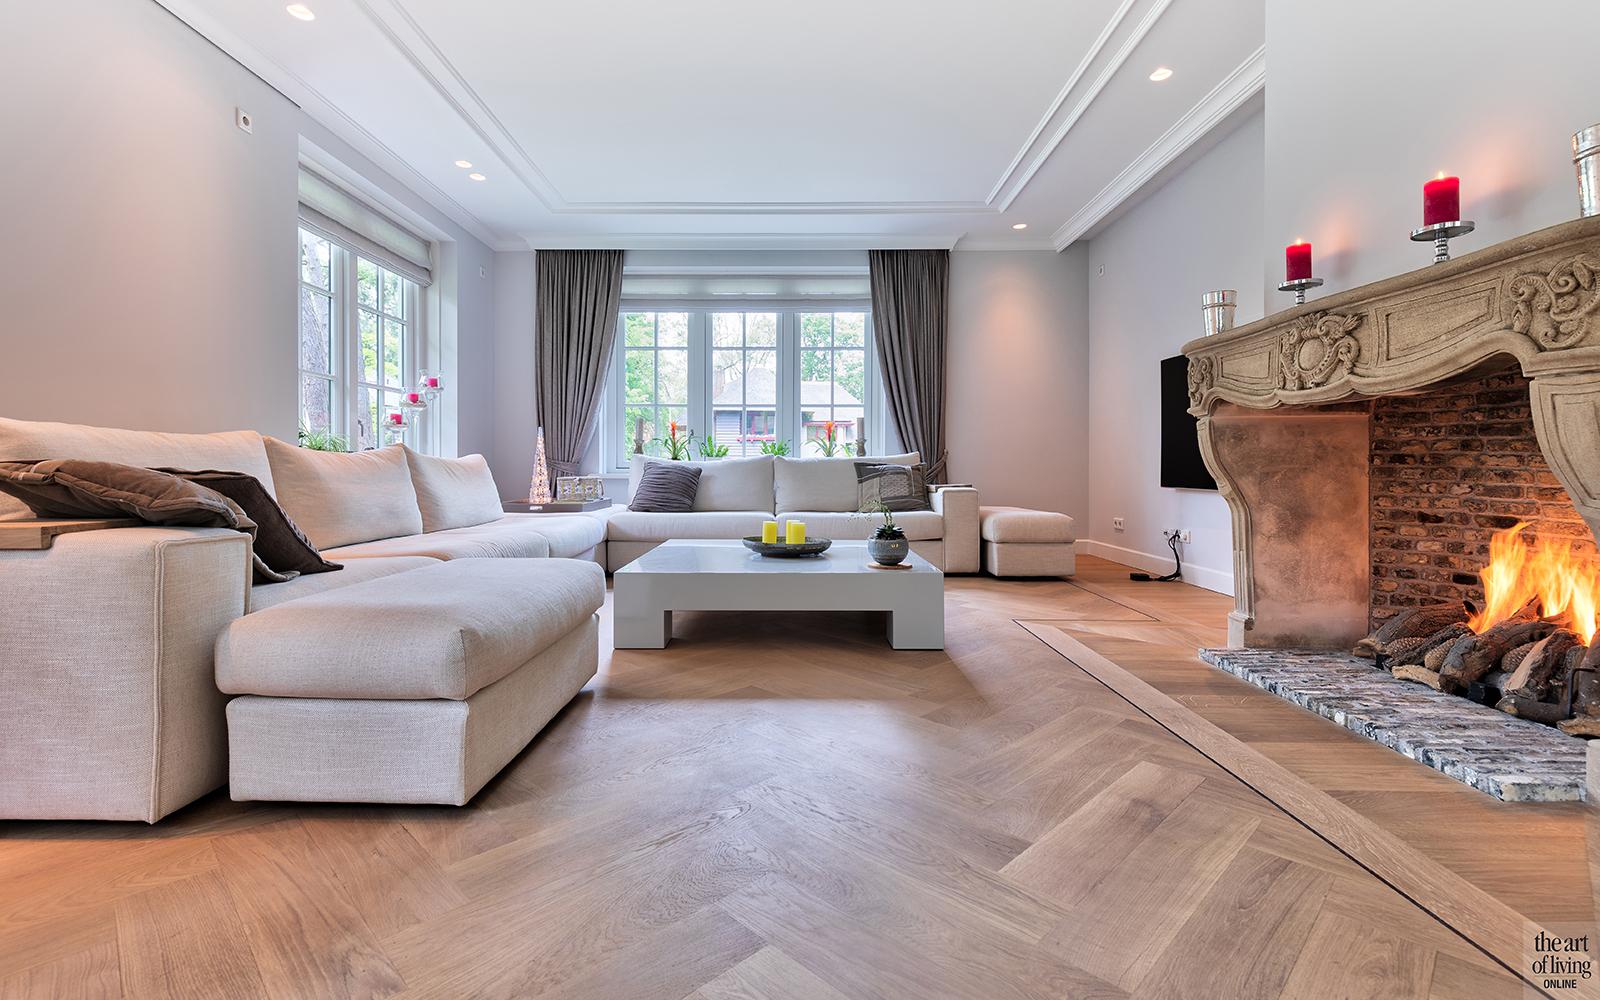 Interieur Strak Klassiek : Klassiek landelijke villa atelier 3 the art of living nl